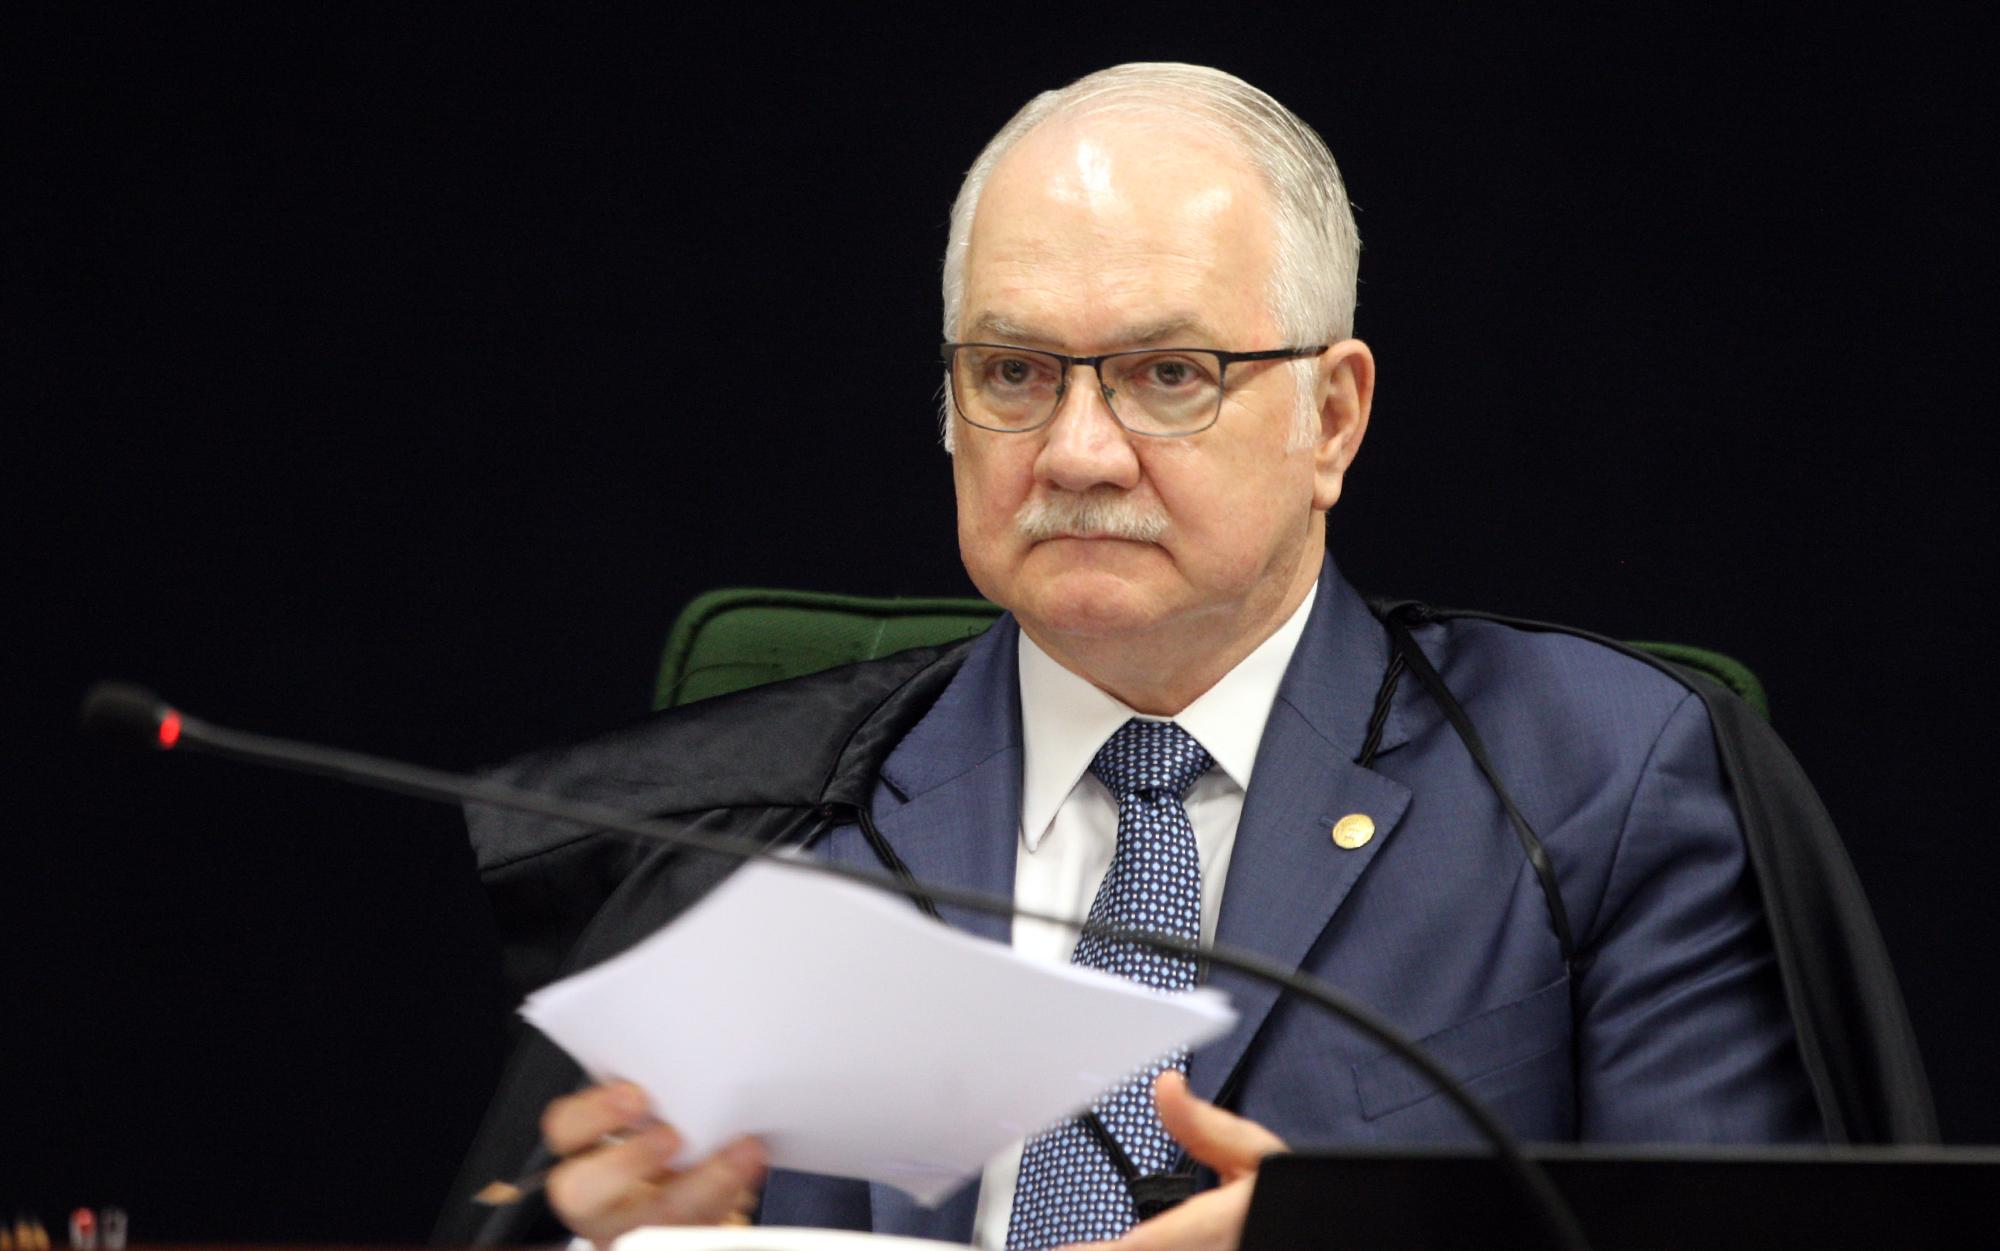 IMAGEM: O bolsonarismo corrompeu a democracia, segundo Fachin